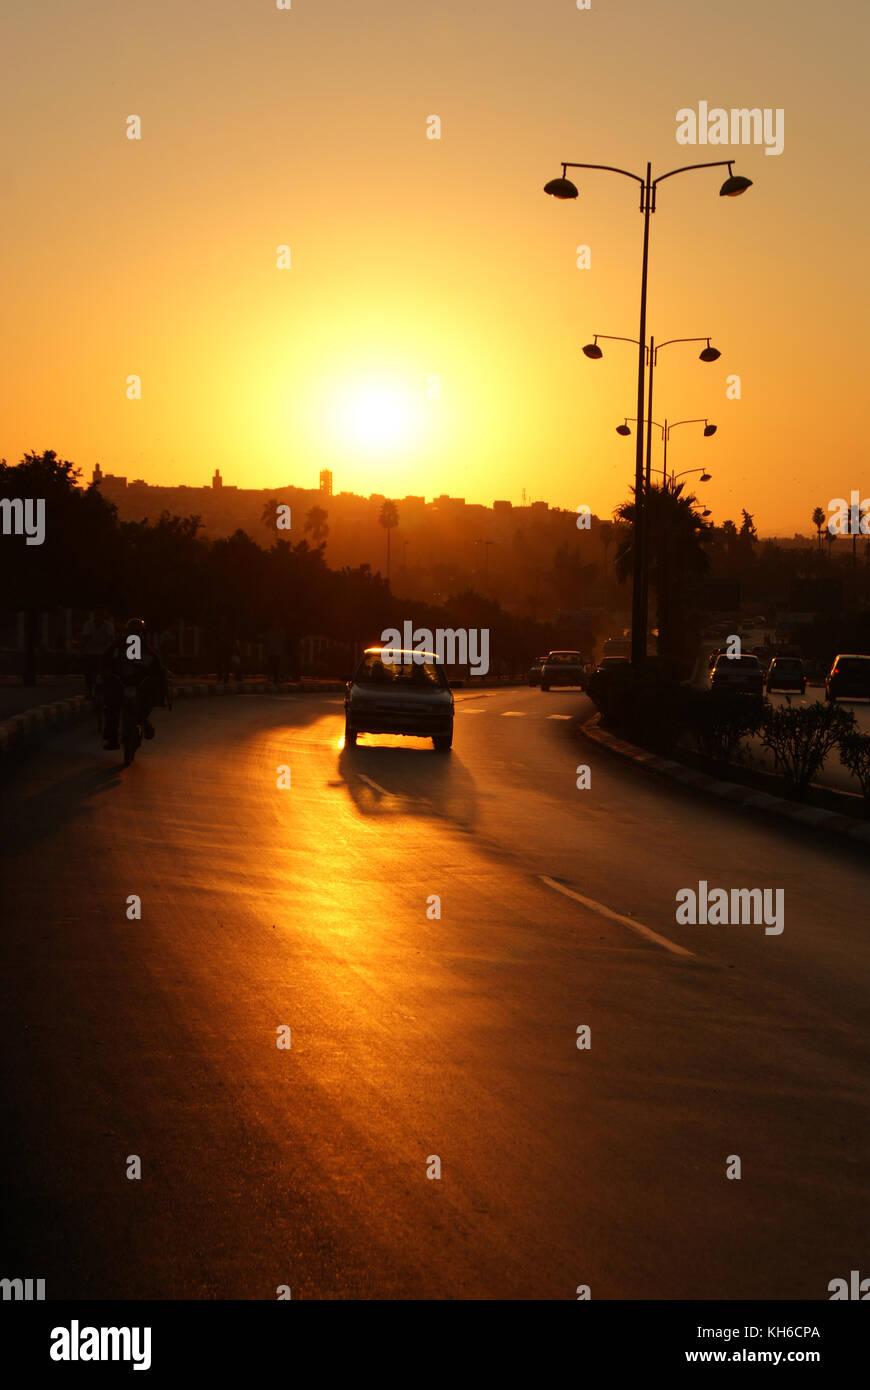 Sunset over Meknes - Stock Image